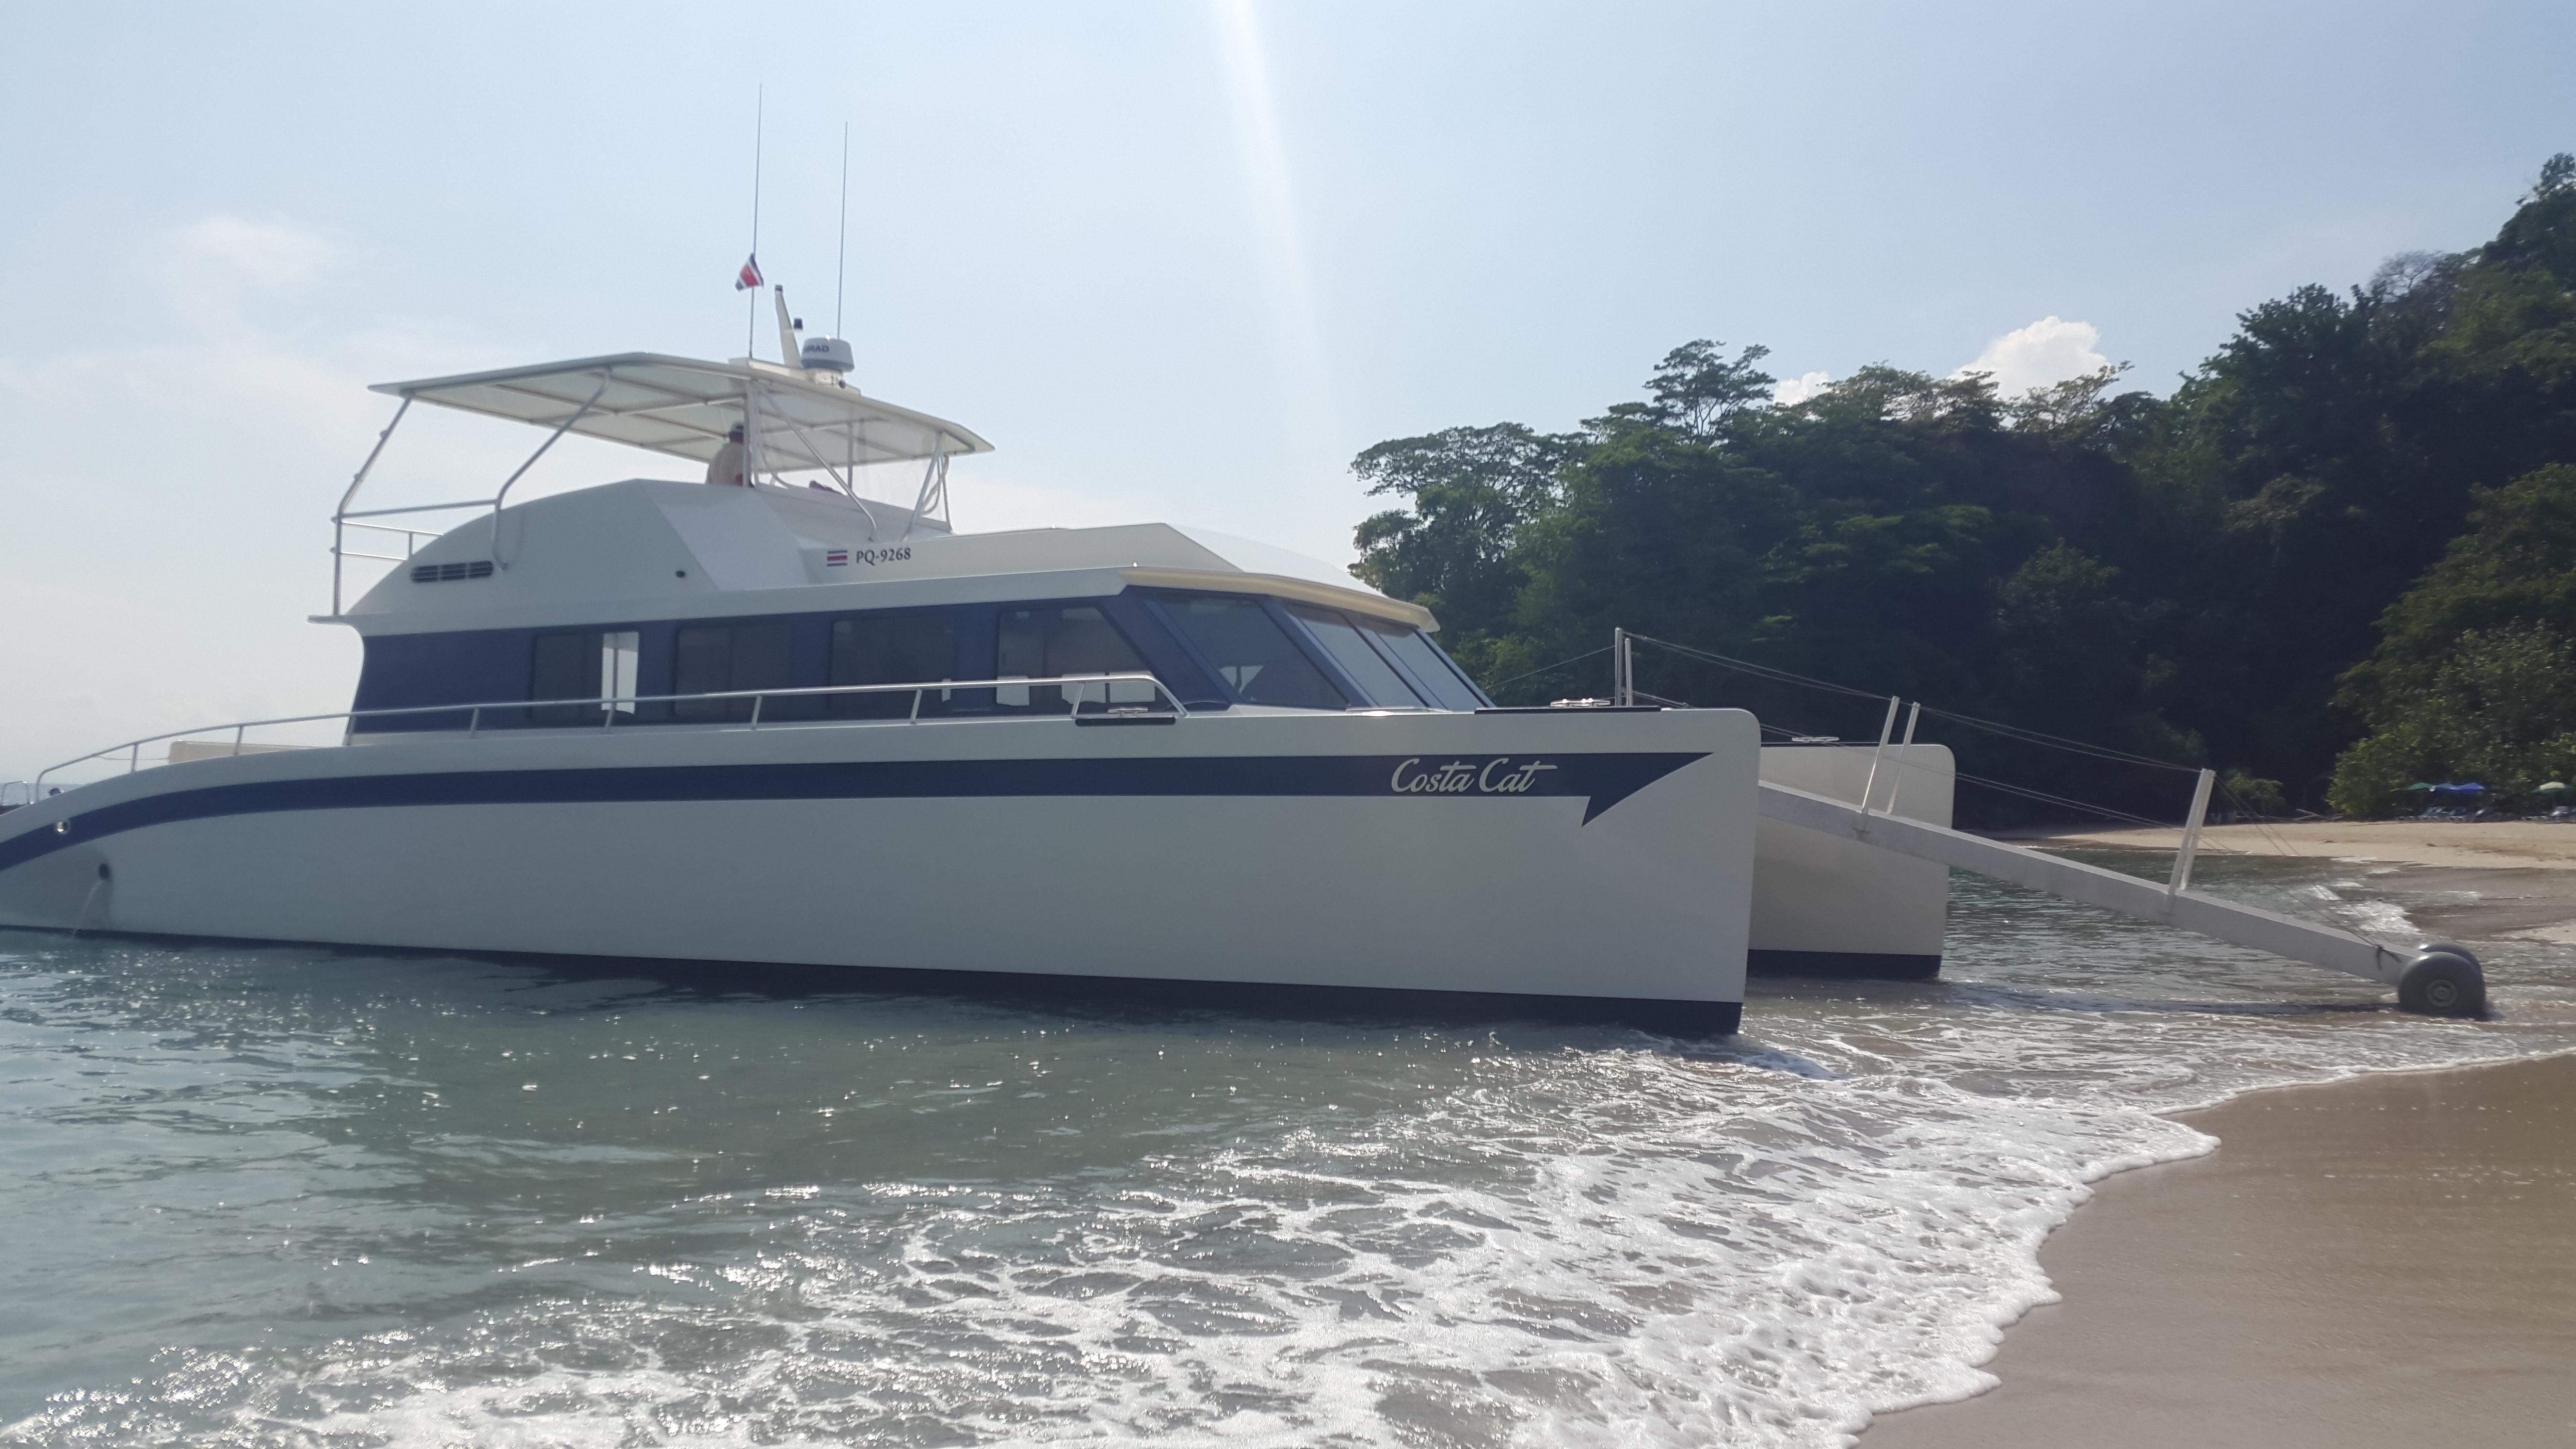 Includes Catamaran Cruise